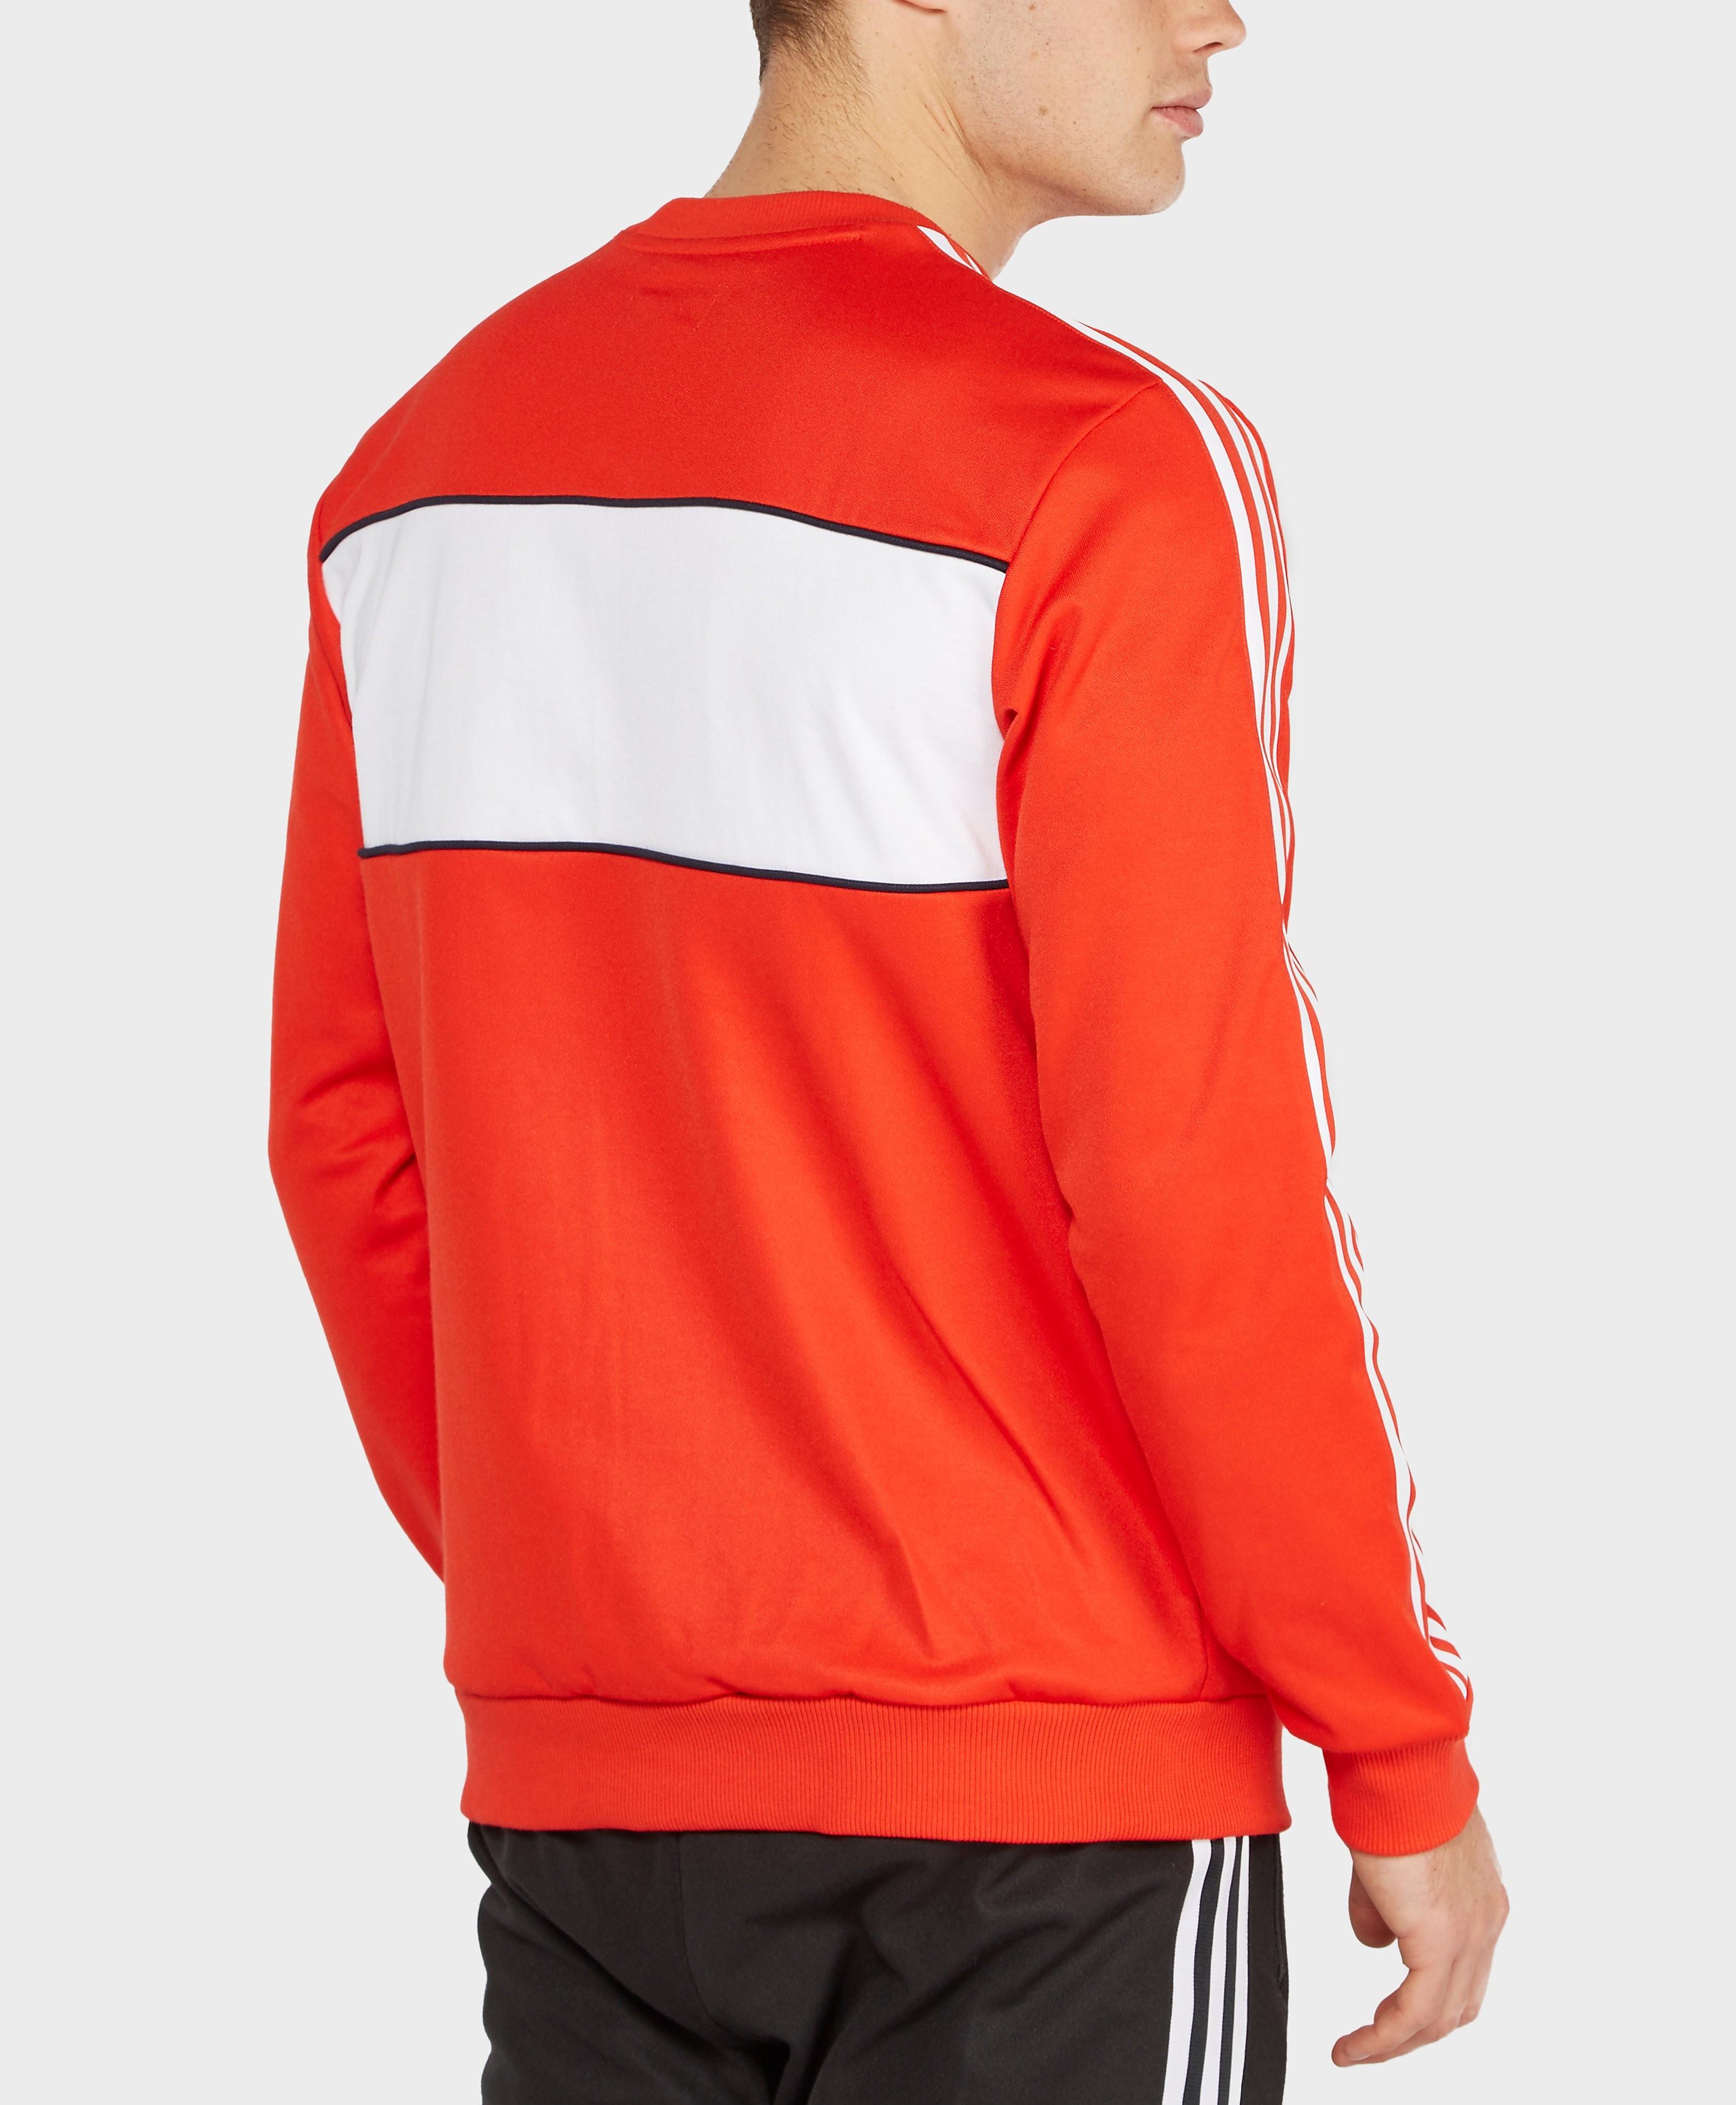 adidas Originals Block Crew Sweatshirt